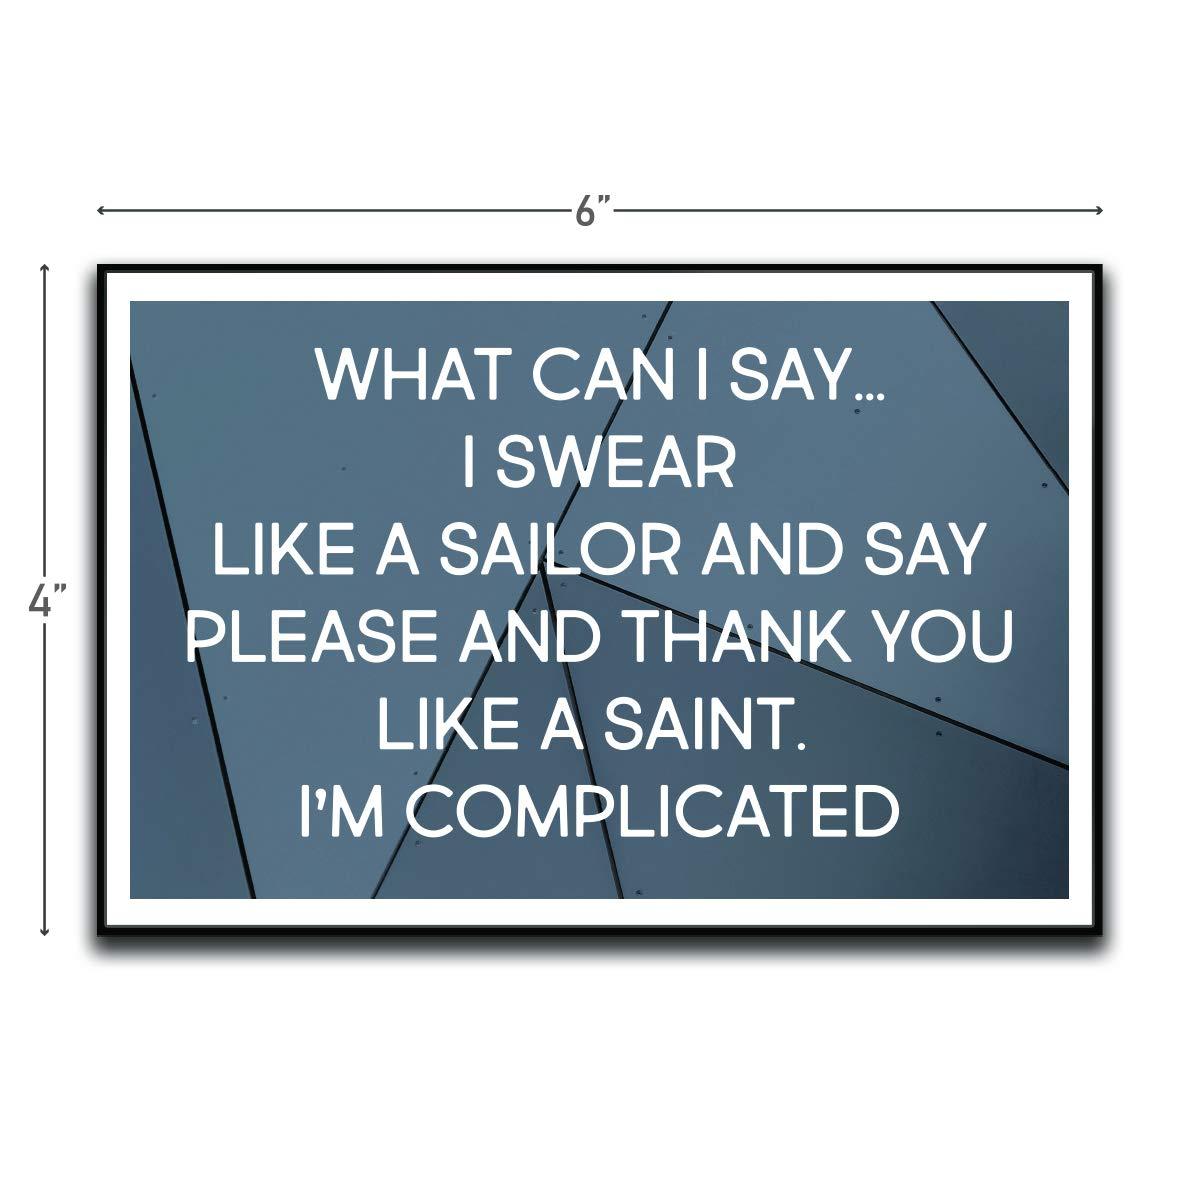 I Swear Like A Sailor Please And Thank You Like A Saint Motivational Inspirational Funny Magnet - Refrigerator Toolbox Locker Car Ammo Can